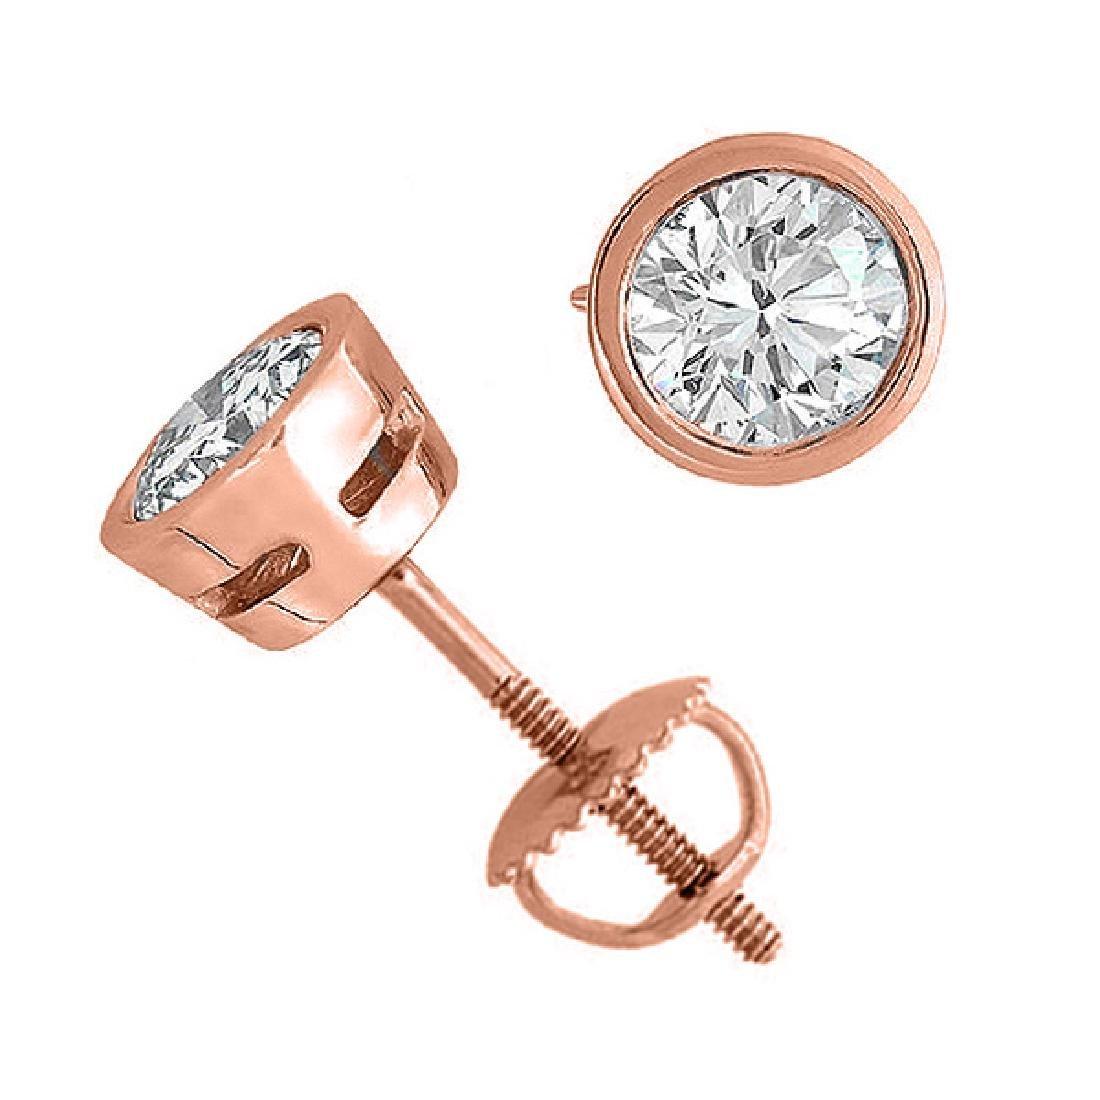 14K Rose Gold Jewelry 2.05 ctw Natural Diamond Stud